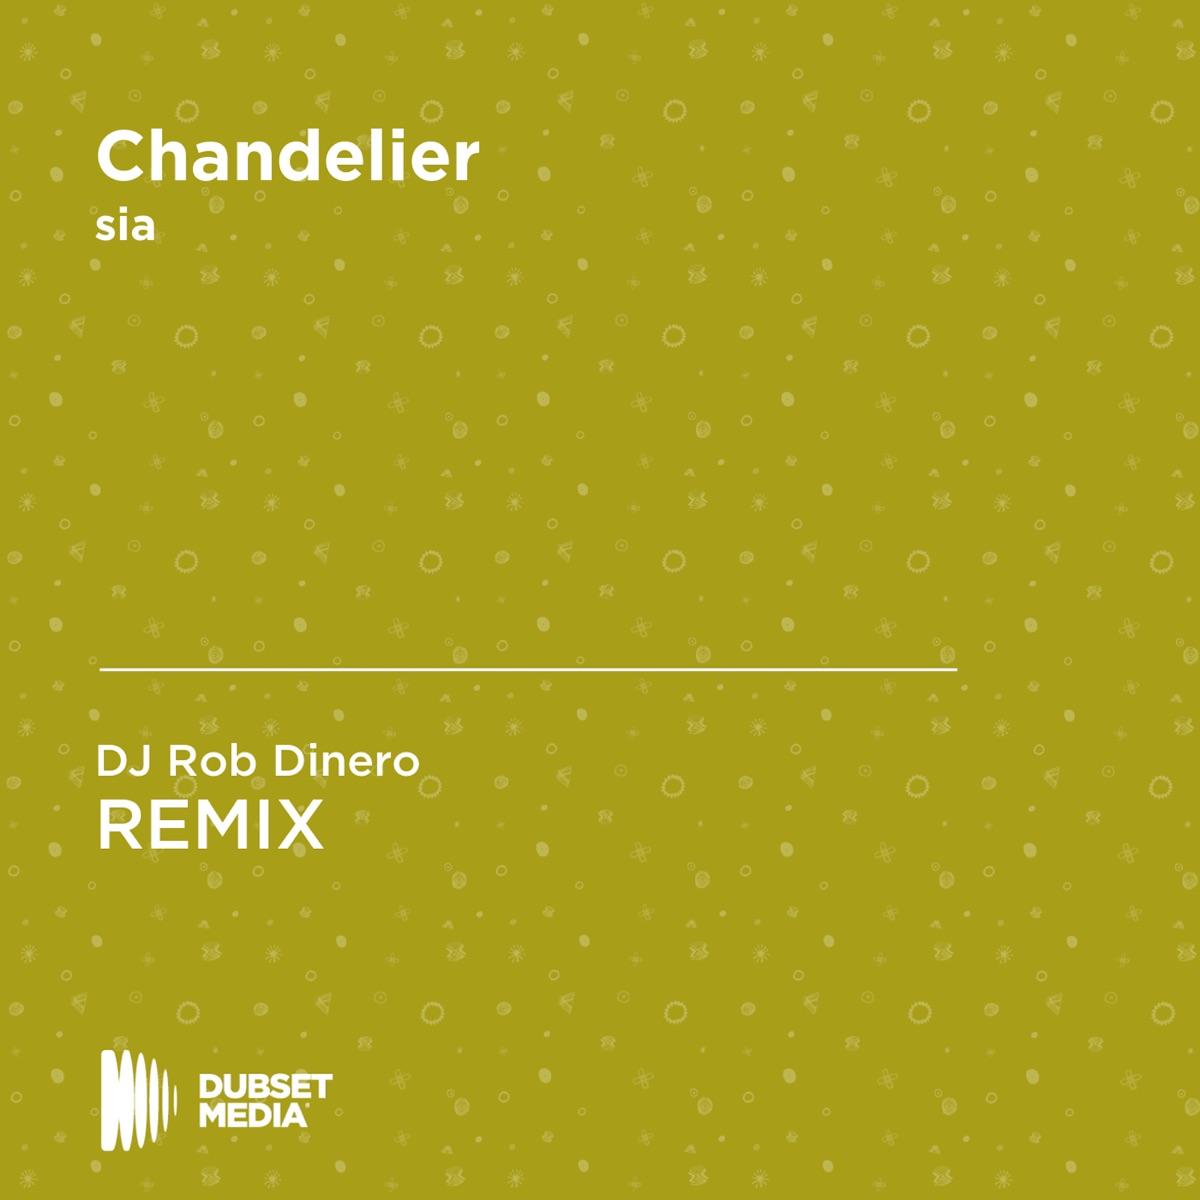 Chandelier DJ Rob Dinero Unofficial Remix Sia - Single DJ Rob Dinero CD cover